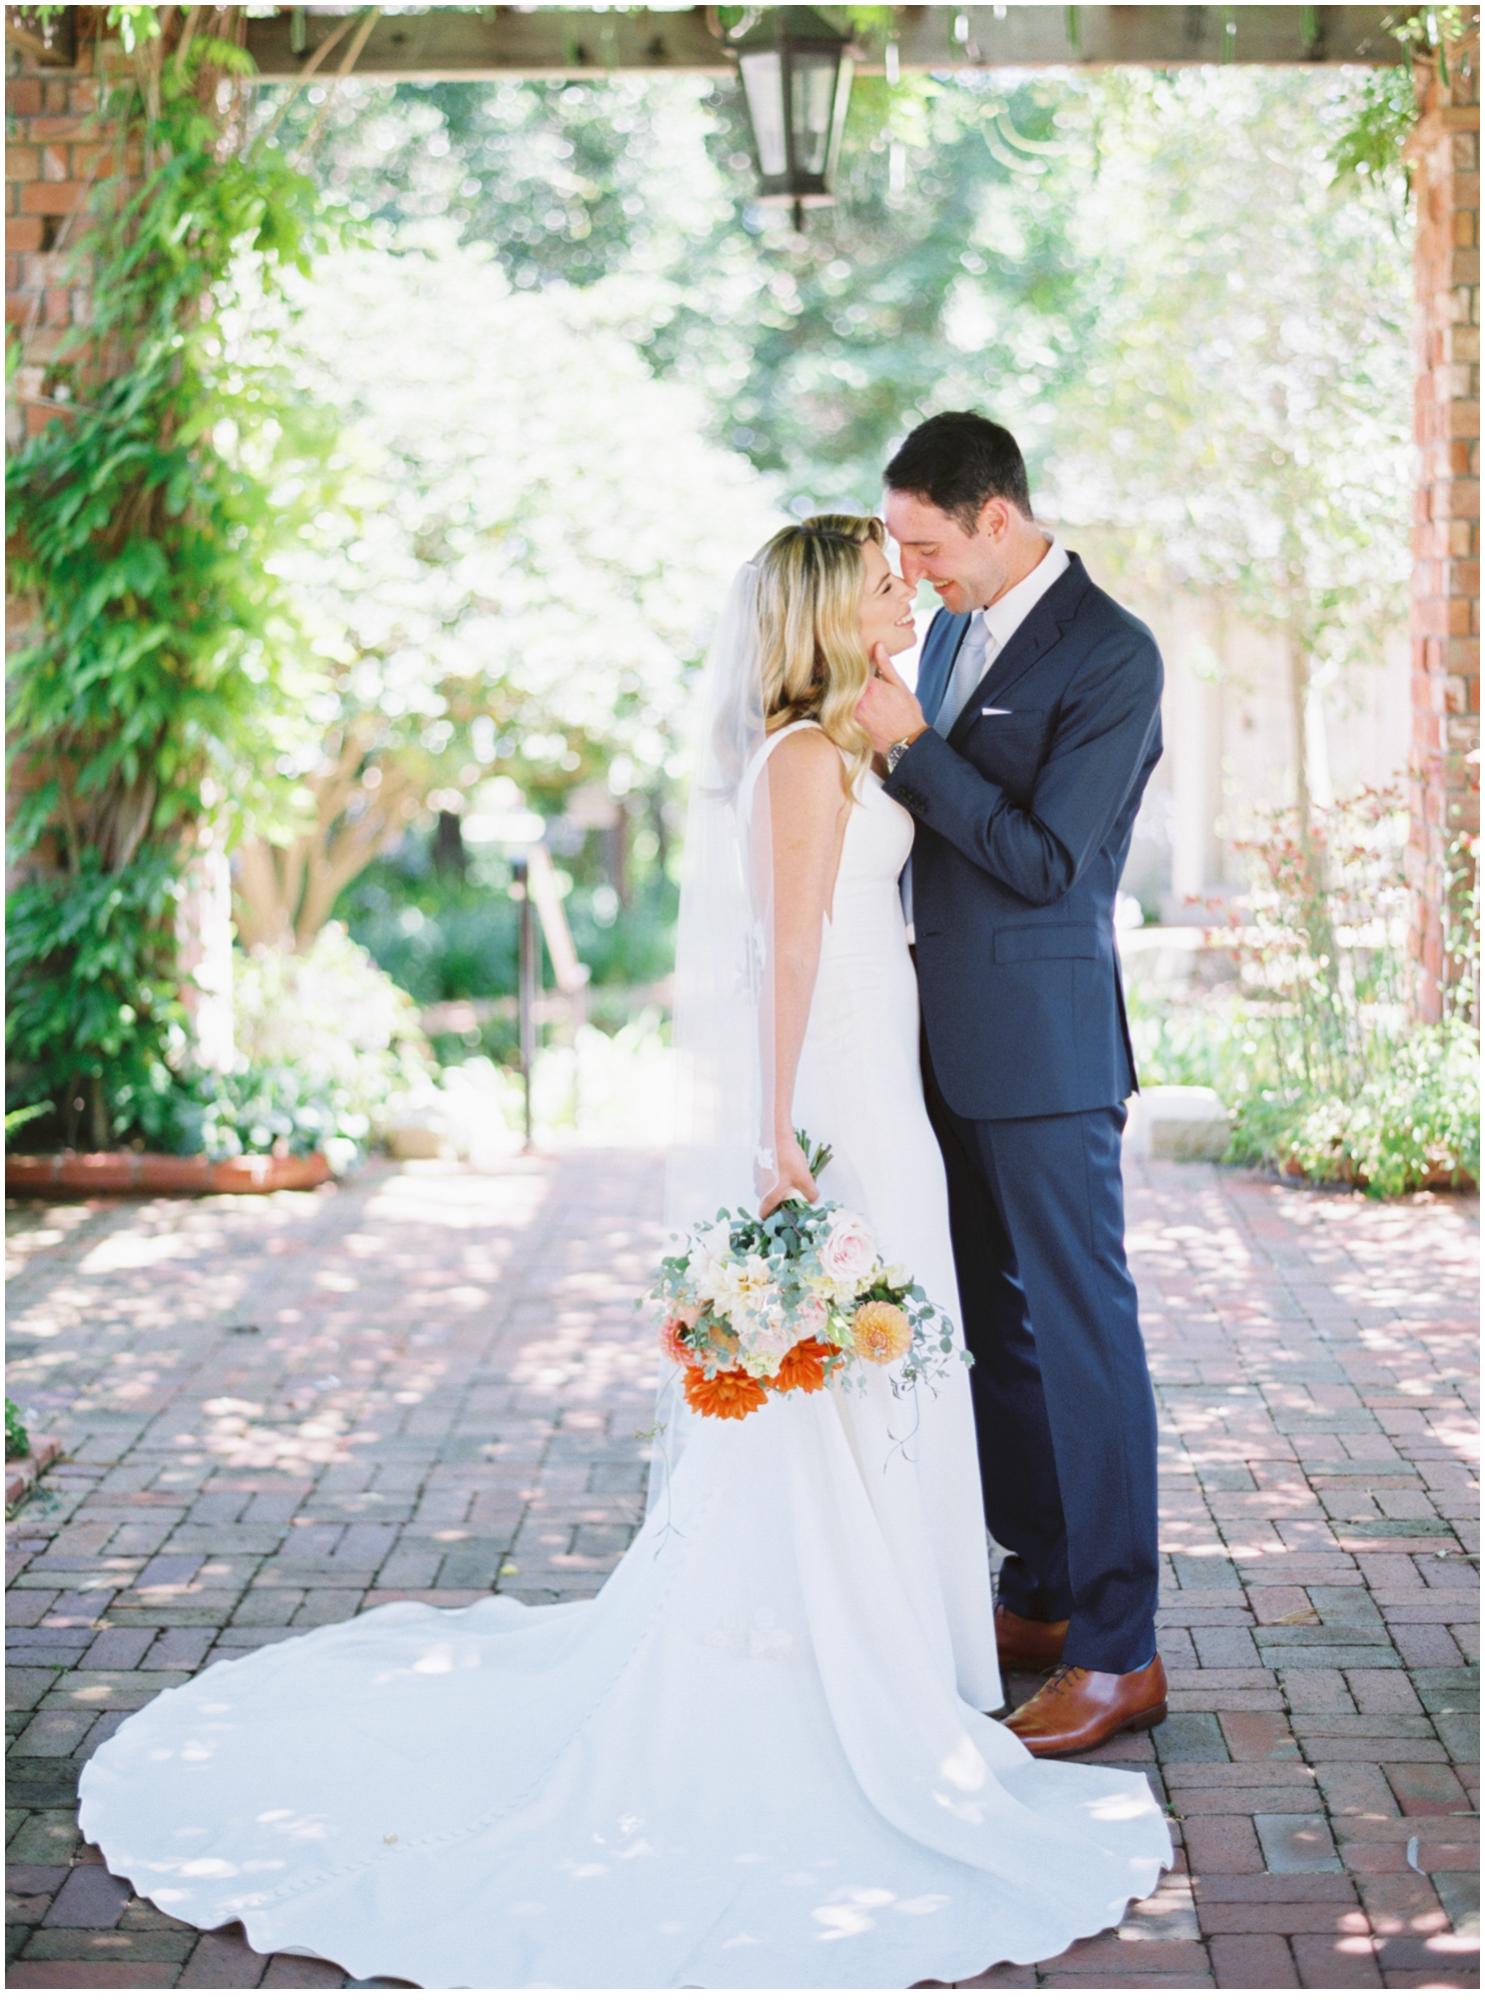 weddingplanningtimeline2.jpg